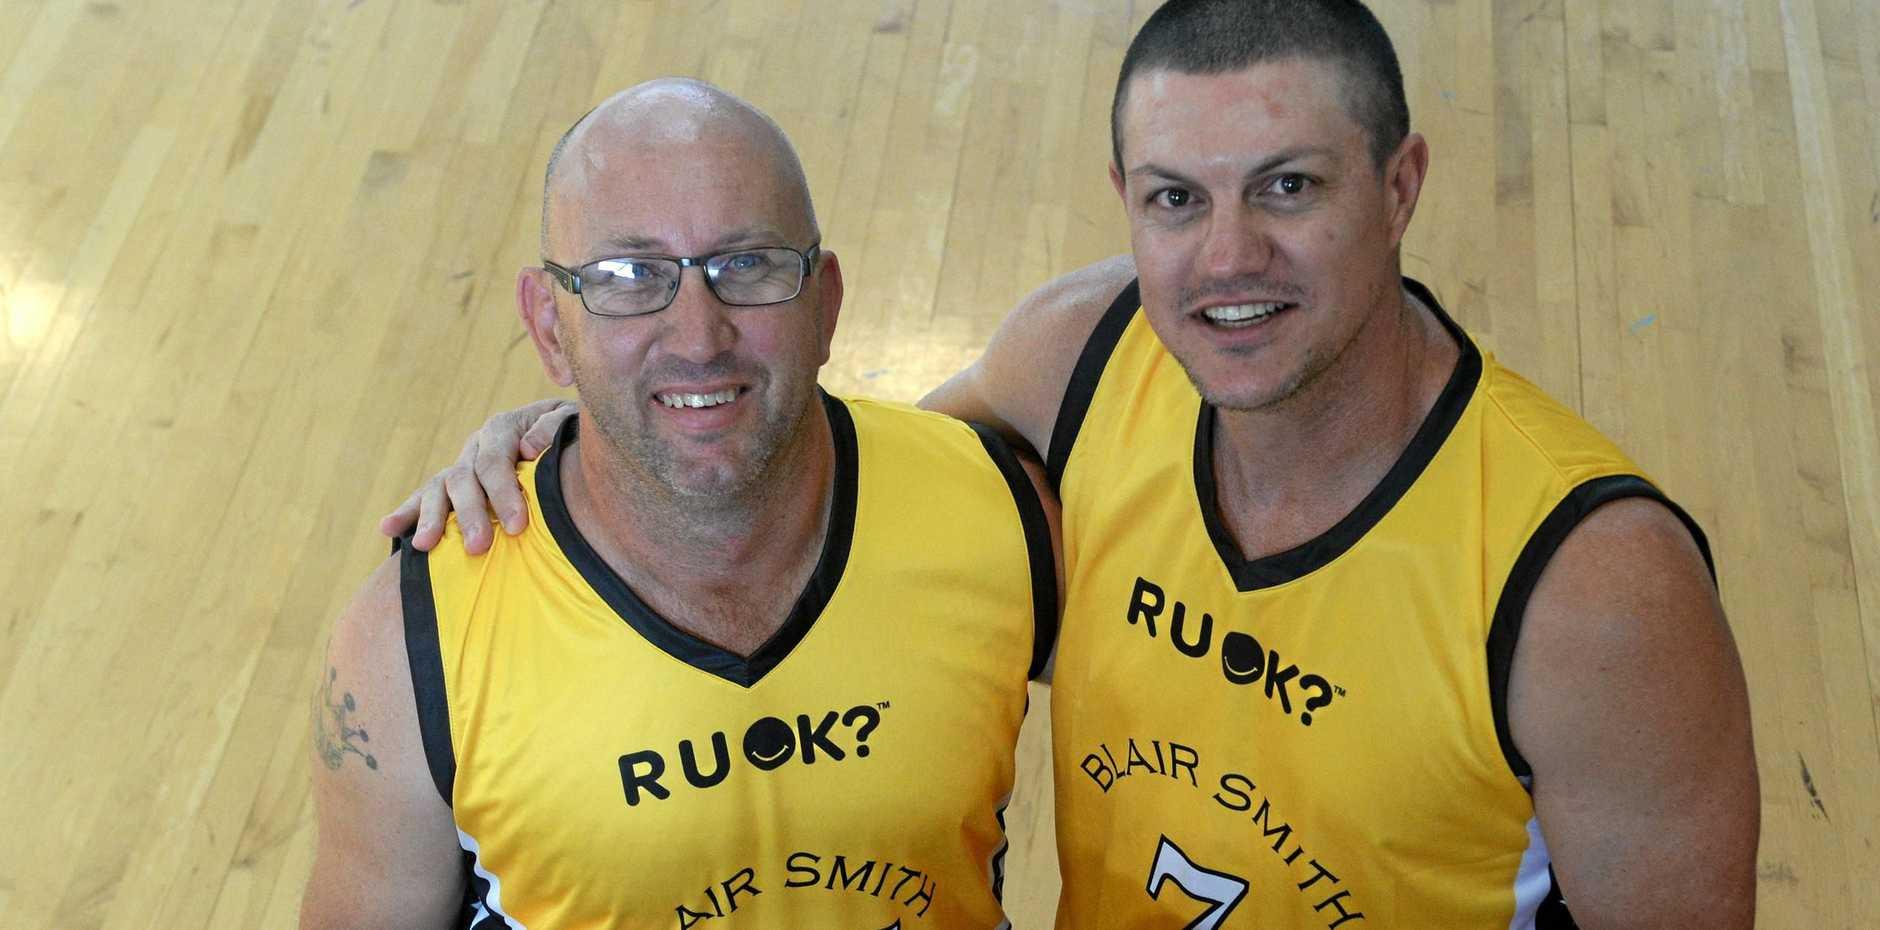 Danny Robson and Tony Campbell are organising the Blair Smith Memorial game at Hegvold Stadium Rockhampton